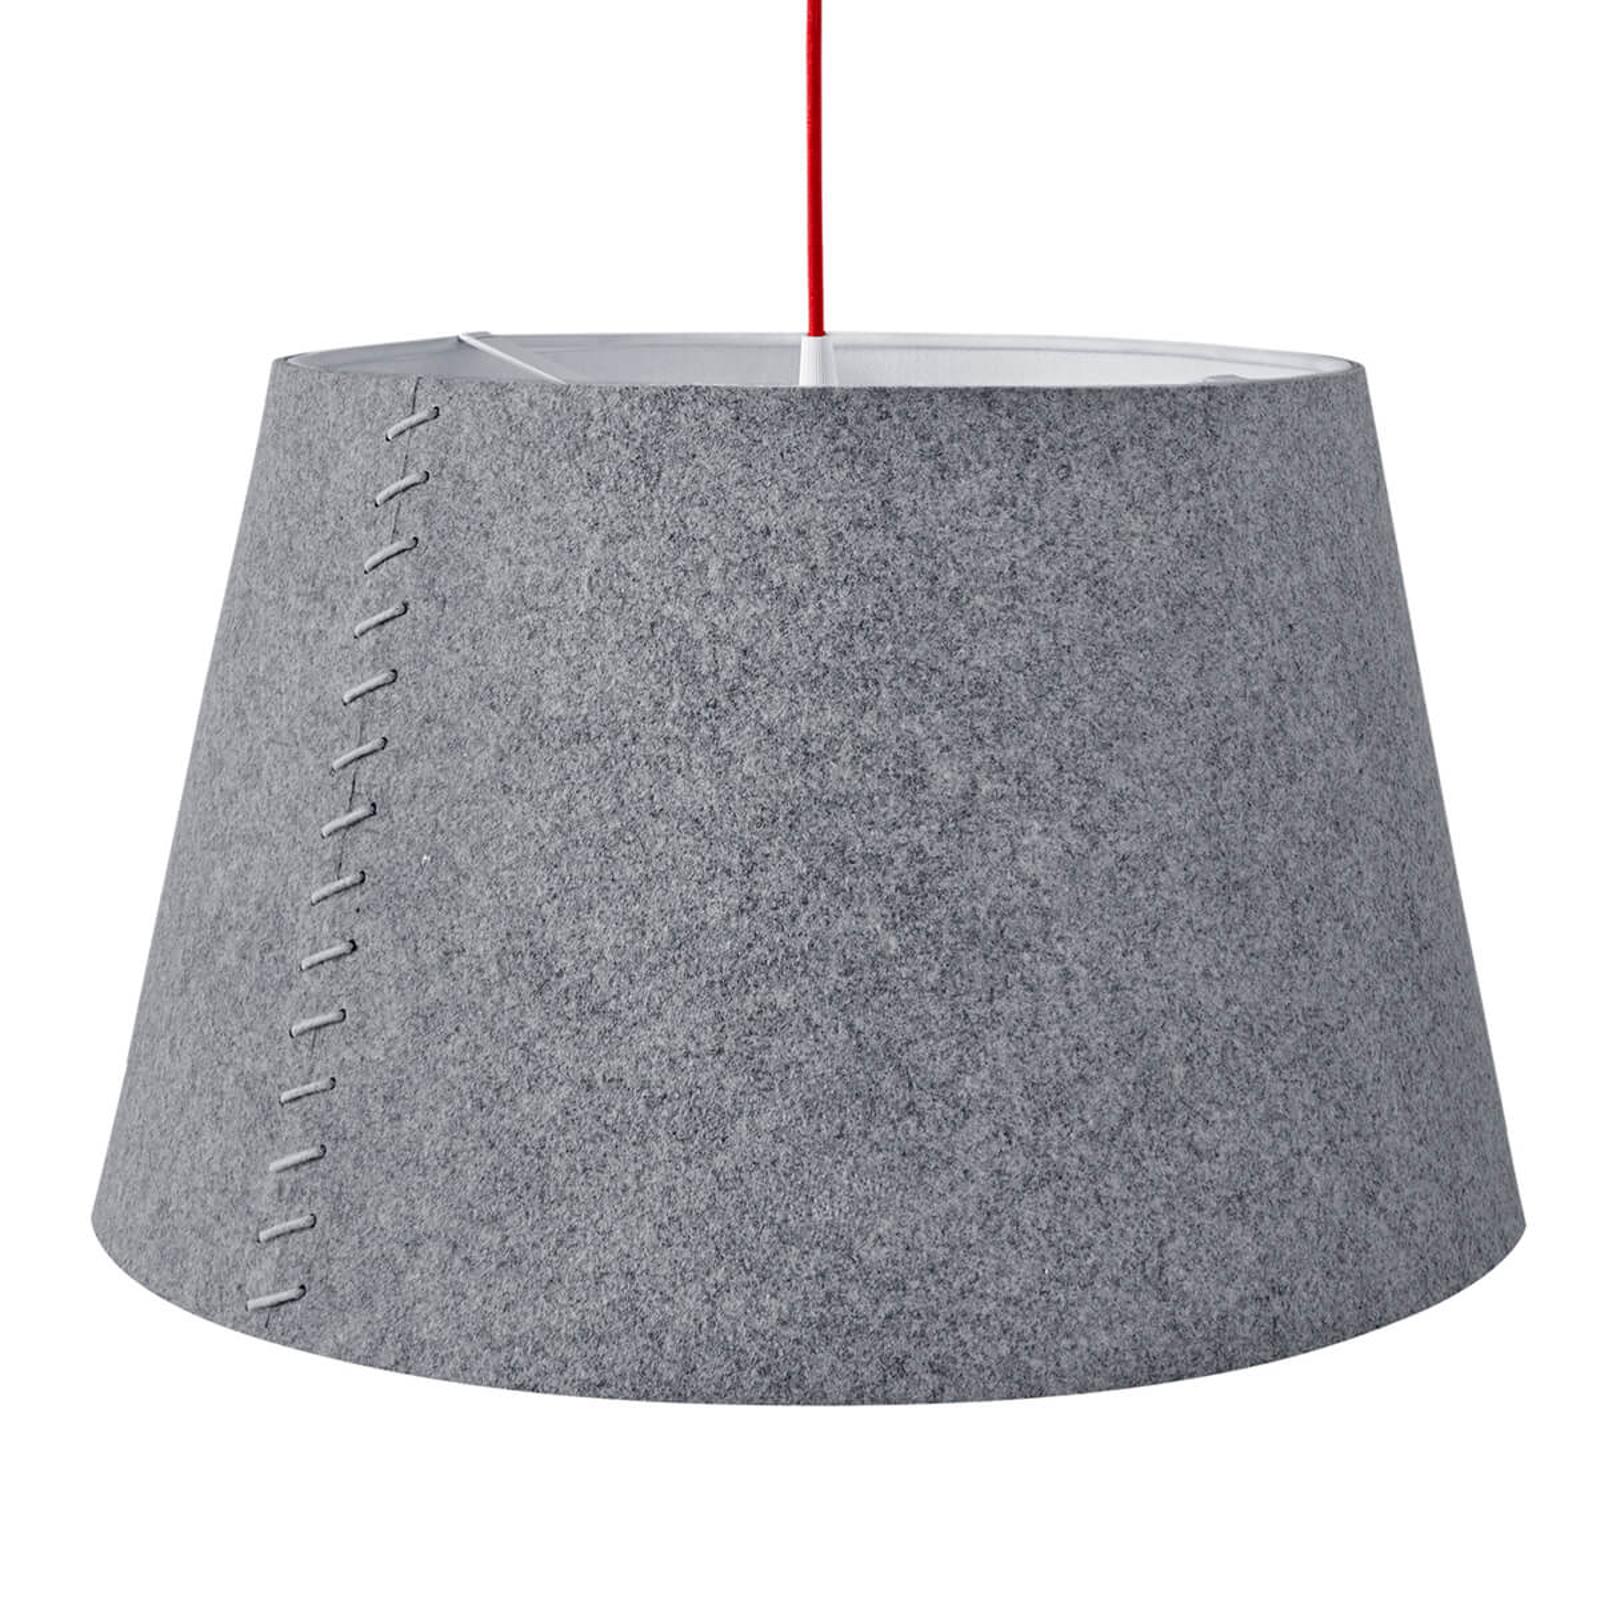 Alice - szara lampa wisząca LED z filcu, 50 cm